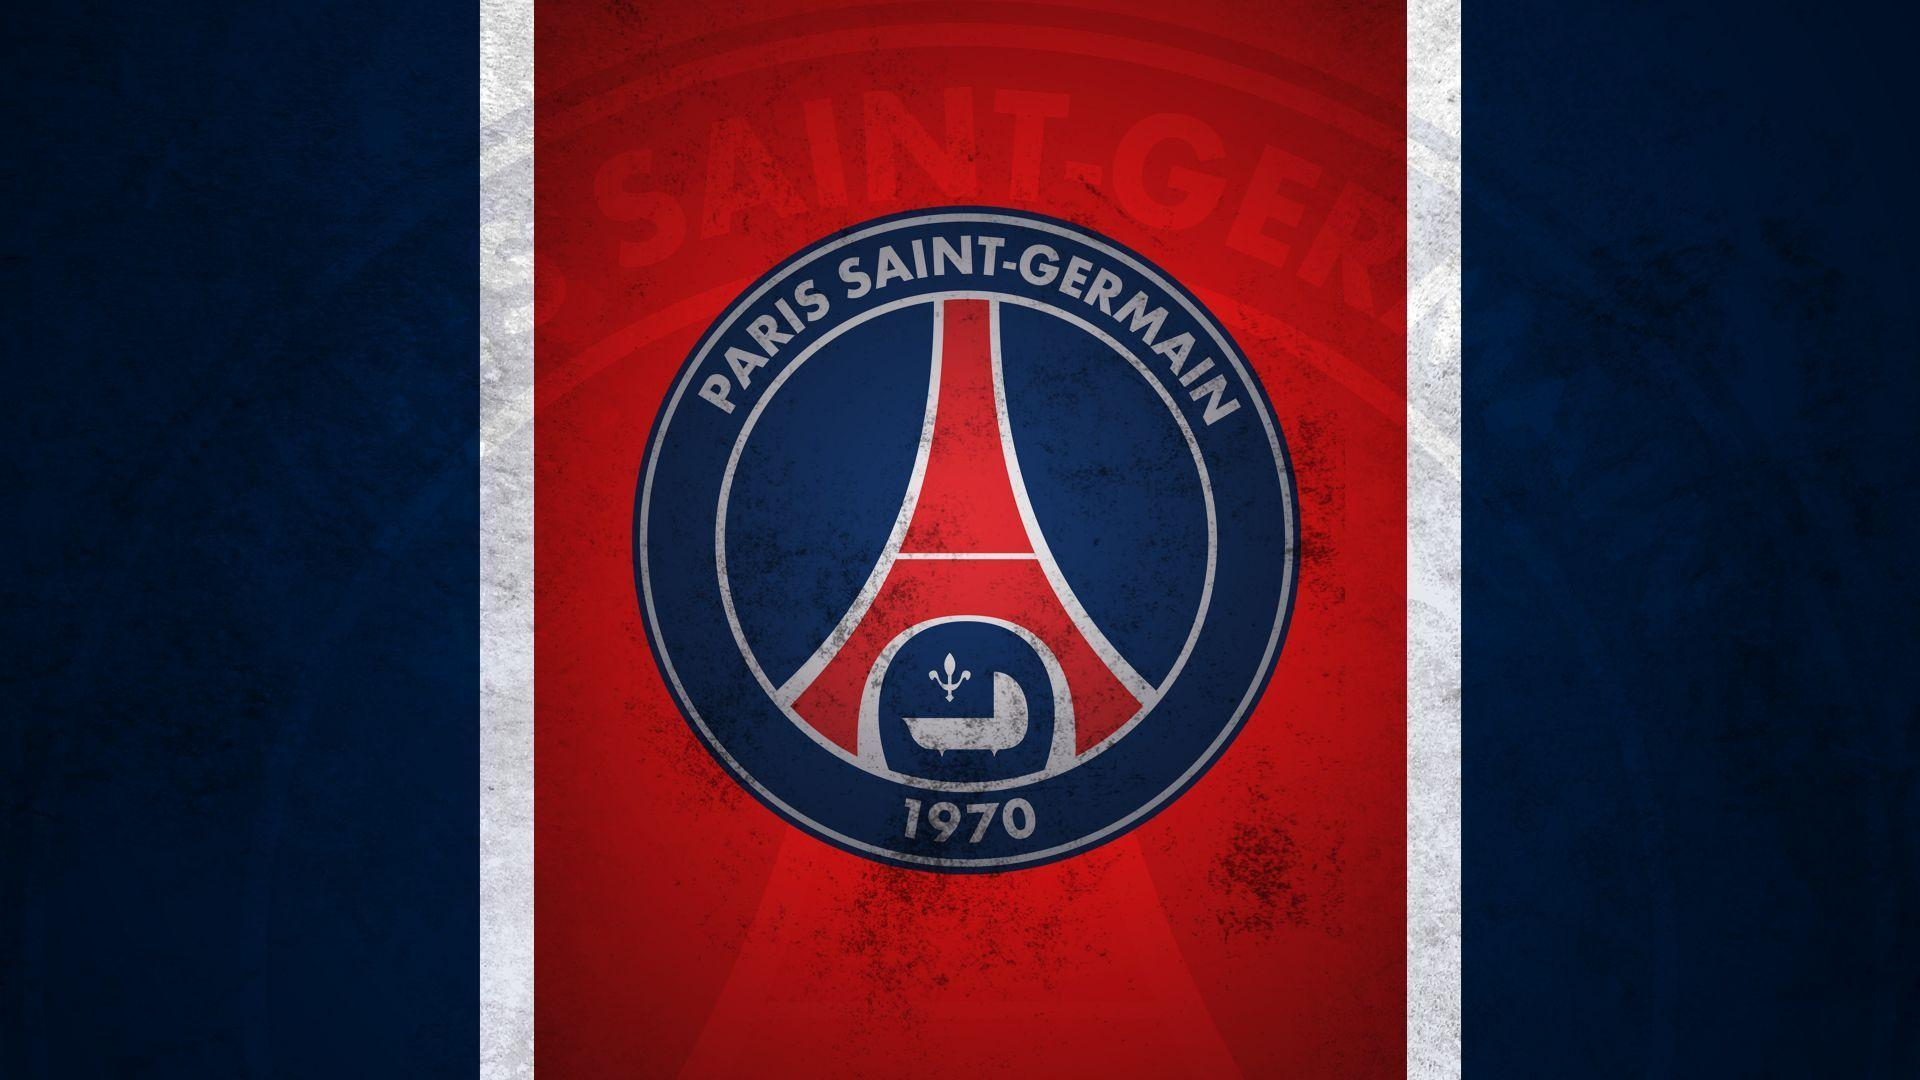 Paris Saint-Germain F.C. Zoom Background